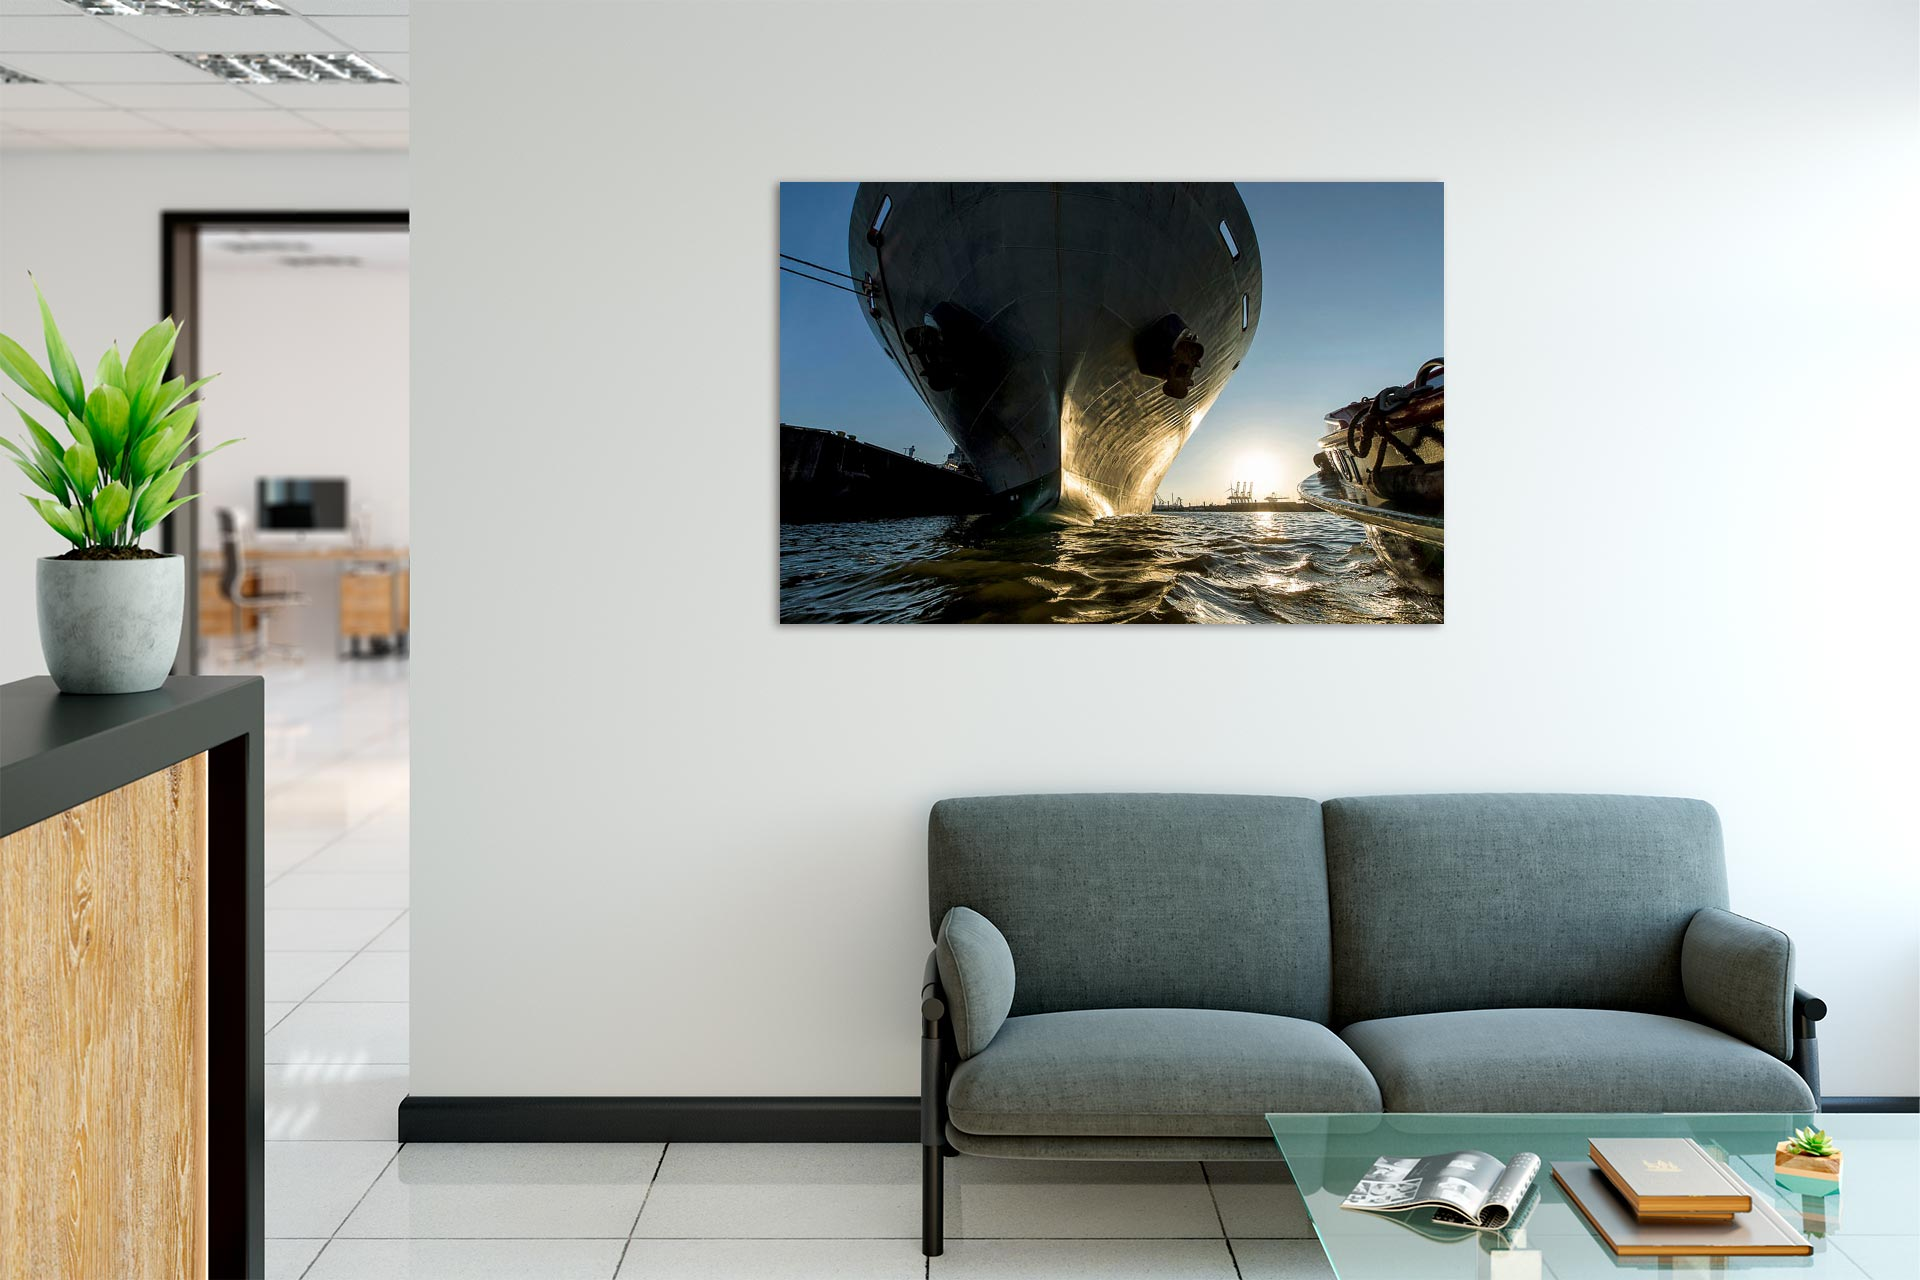 NL061-stek-ut-hamburg-wandbild-auf-leinwand-acrylglas-aludibond-empfang